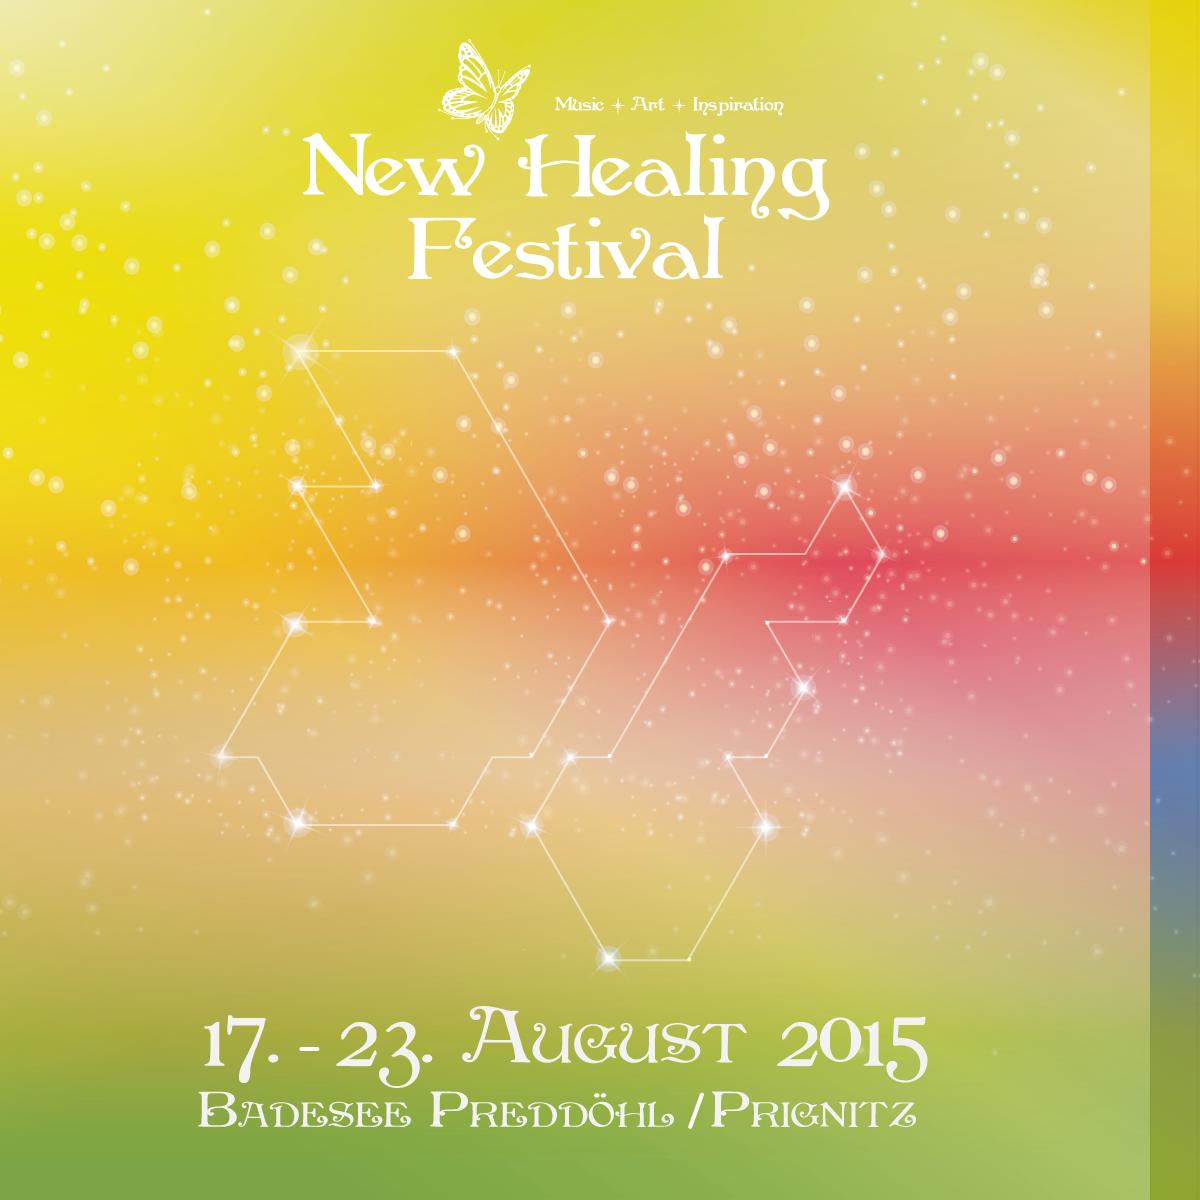 NHF-2015-Facebook-Image